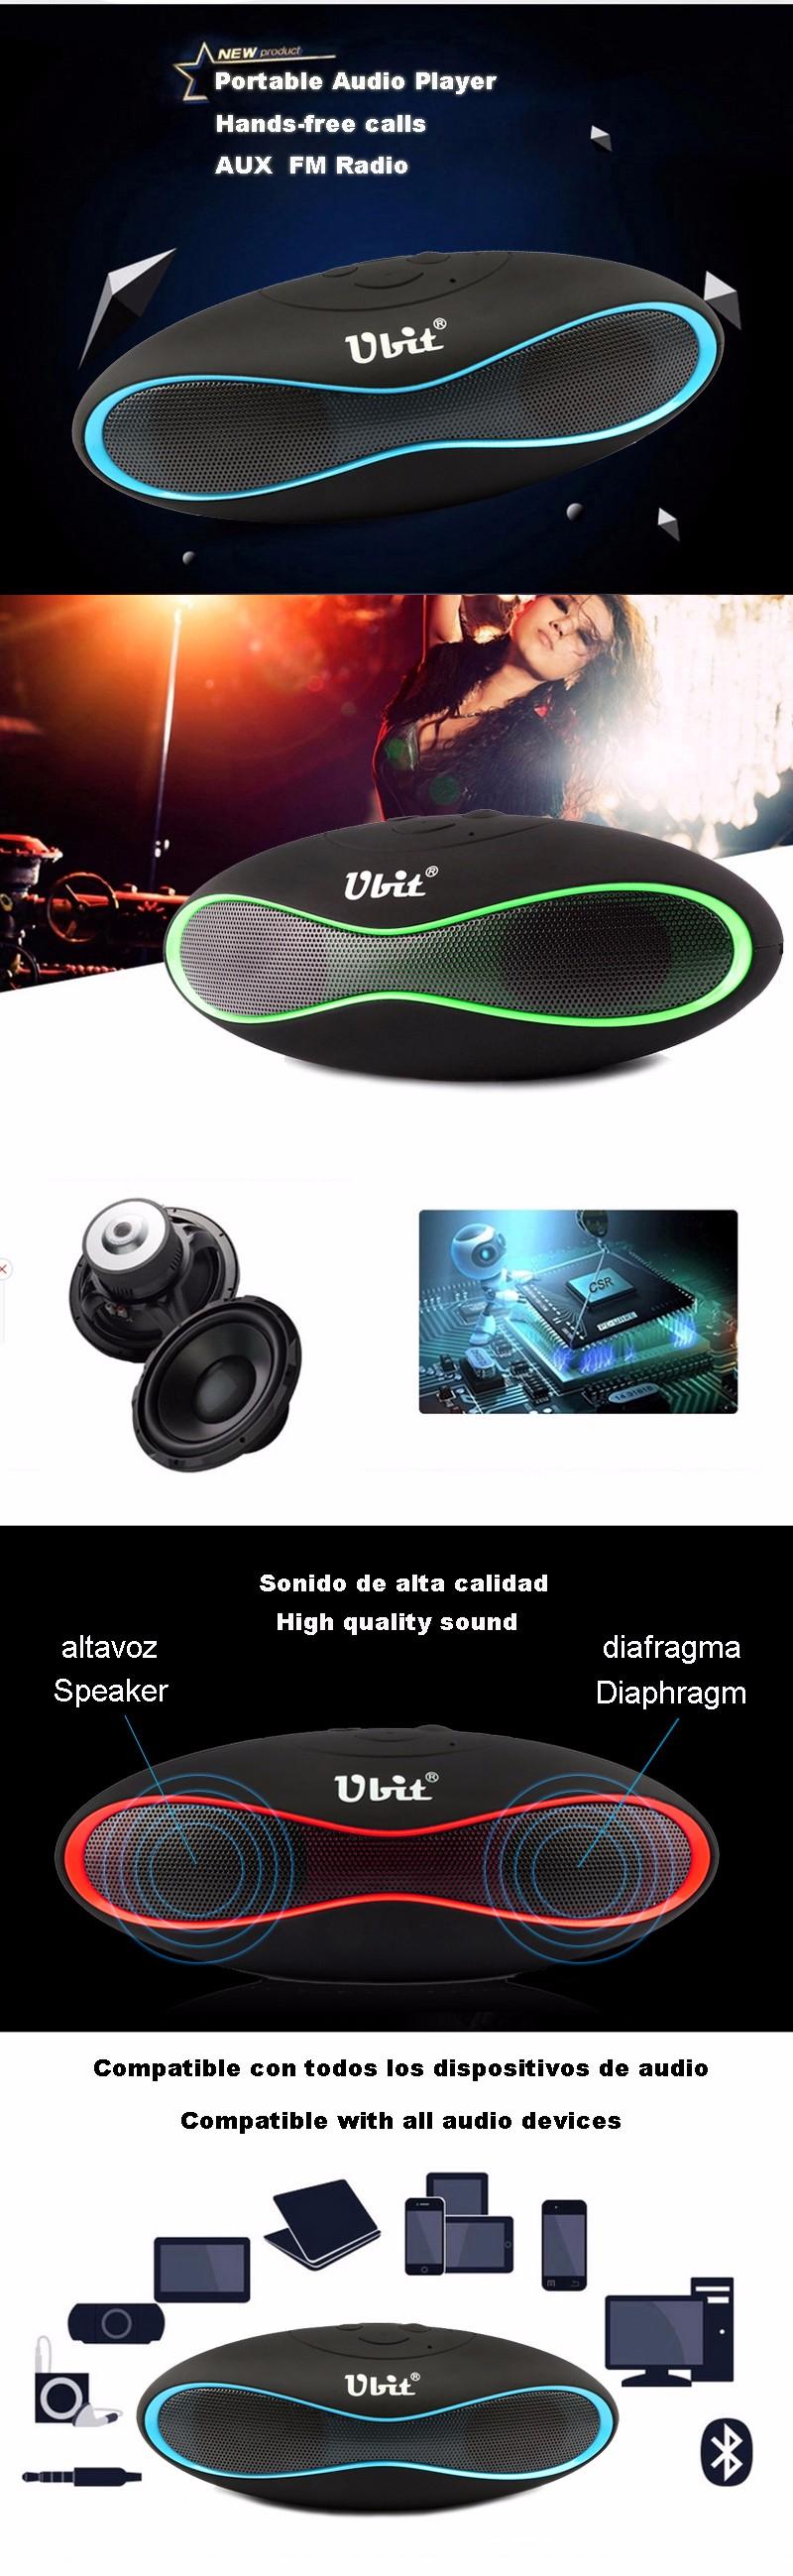 X6U bluetooth speaker spain 4